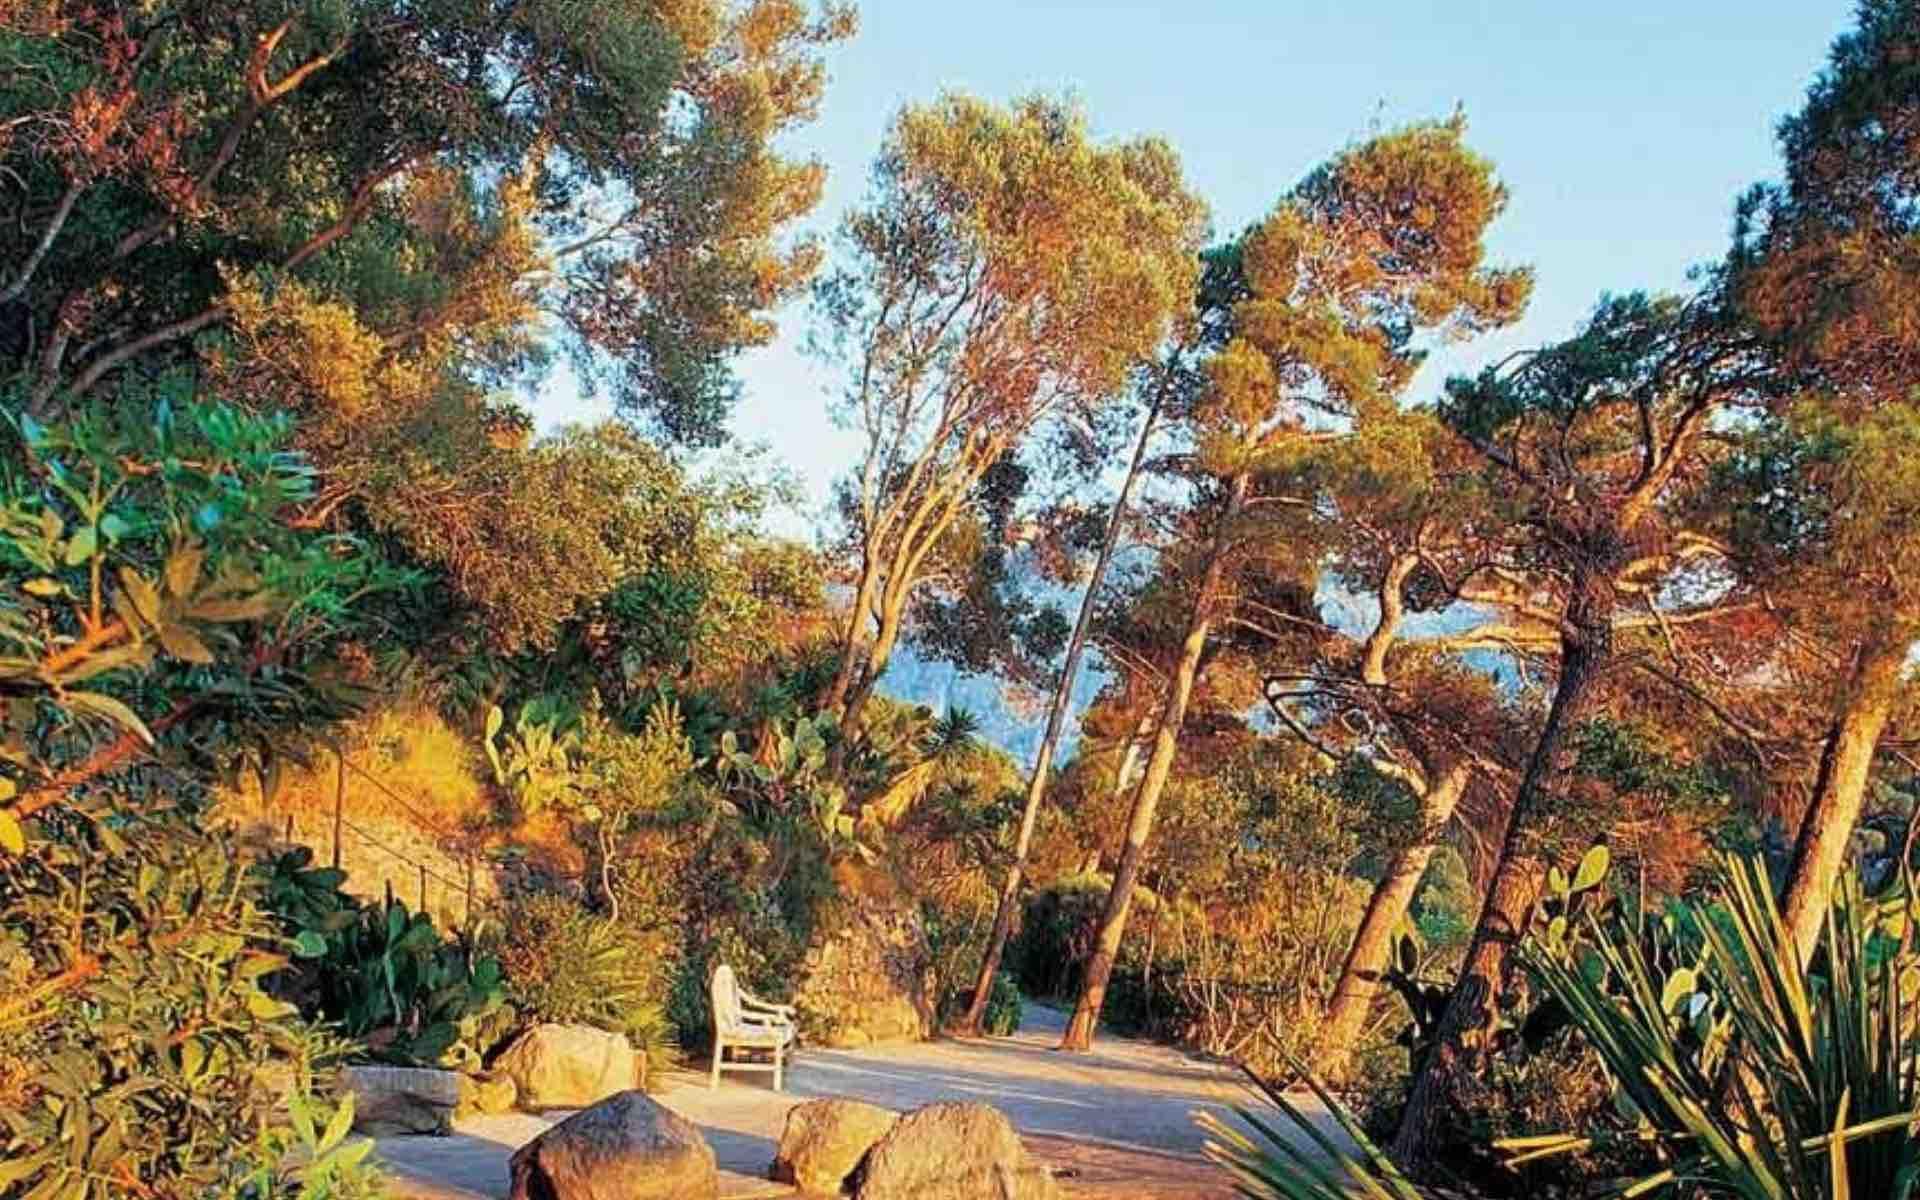 parcs et jardins italiens une